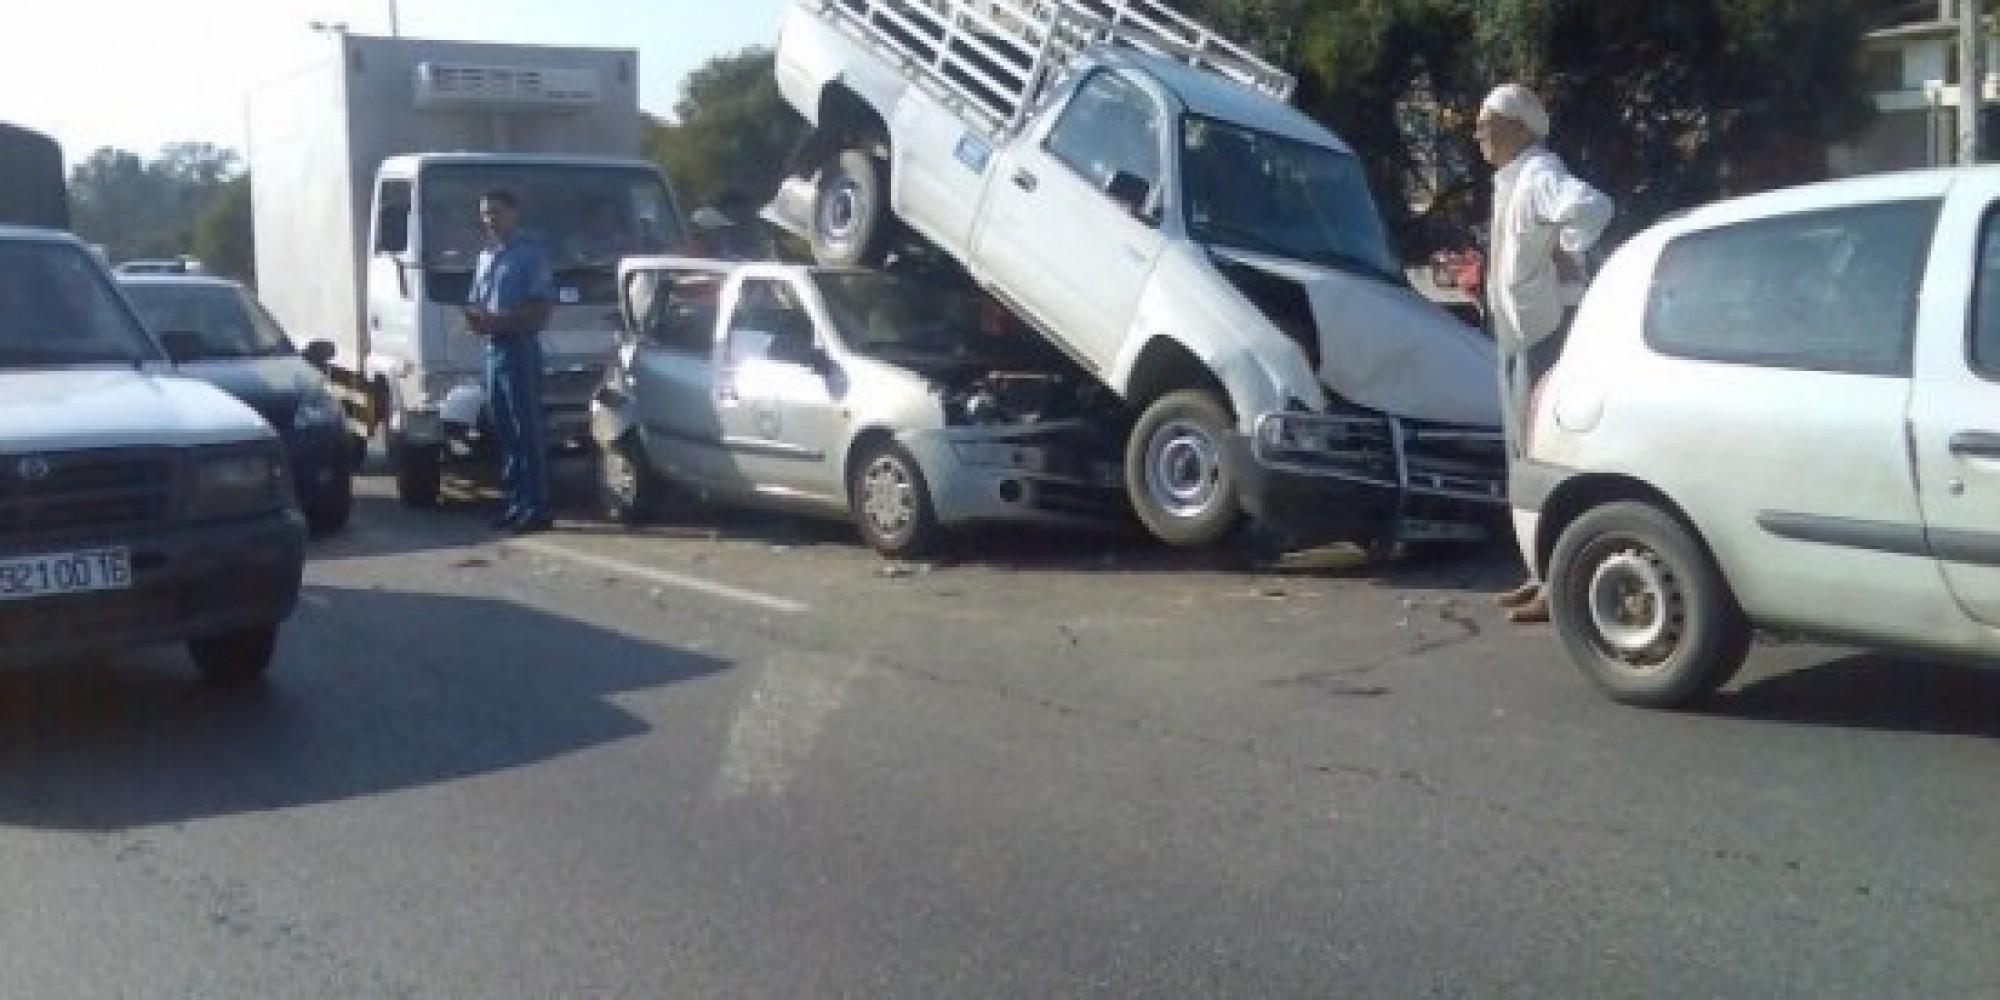 accident de voiture en algerie aujourd hui. Black Bedroom Furniture Sets. Home Design Ideas